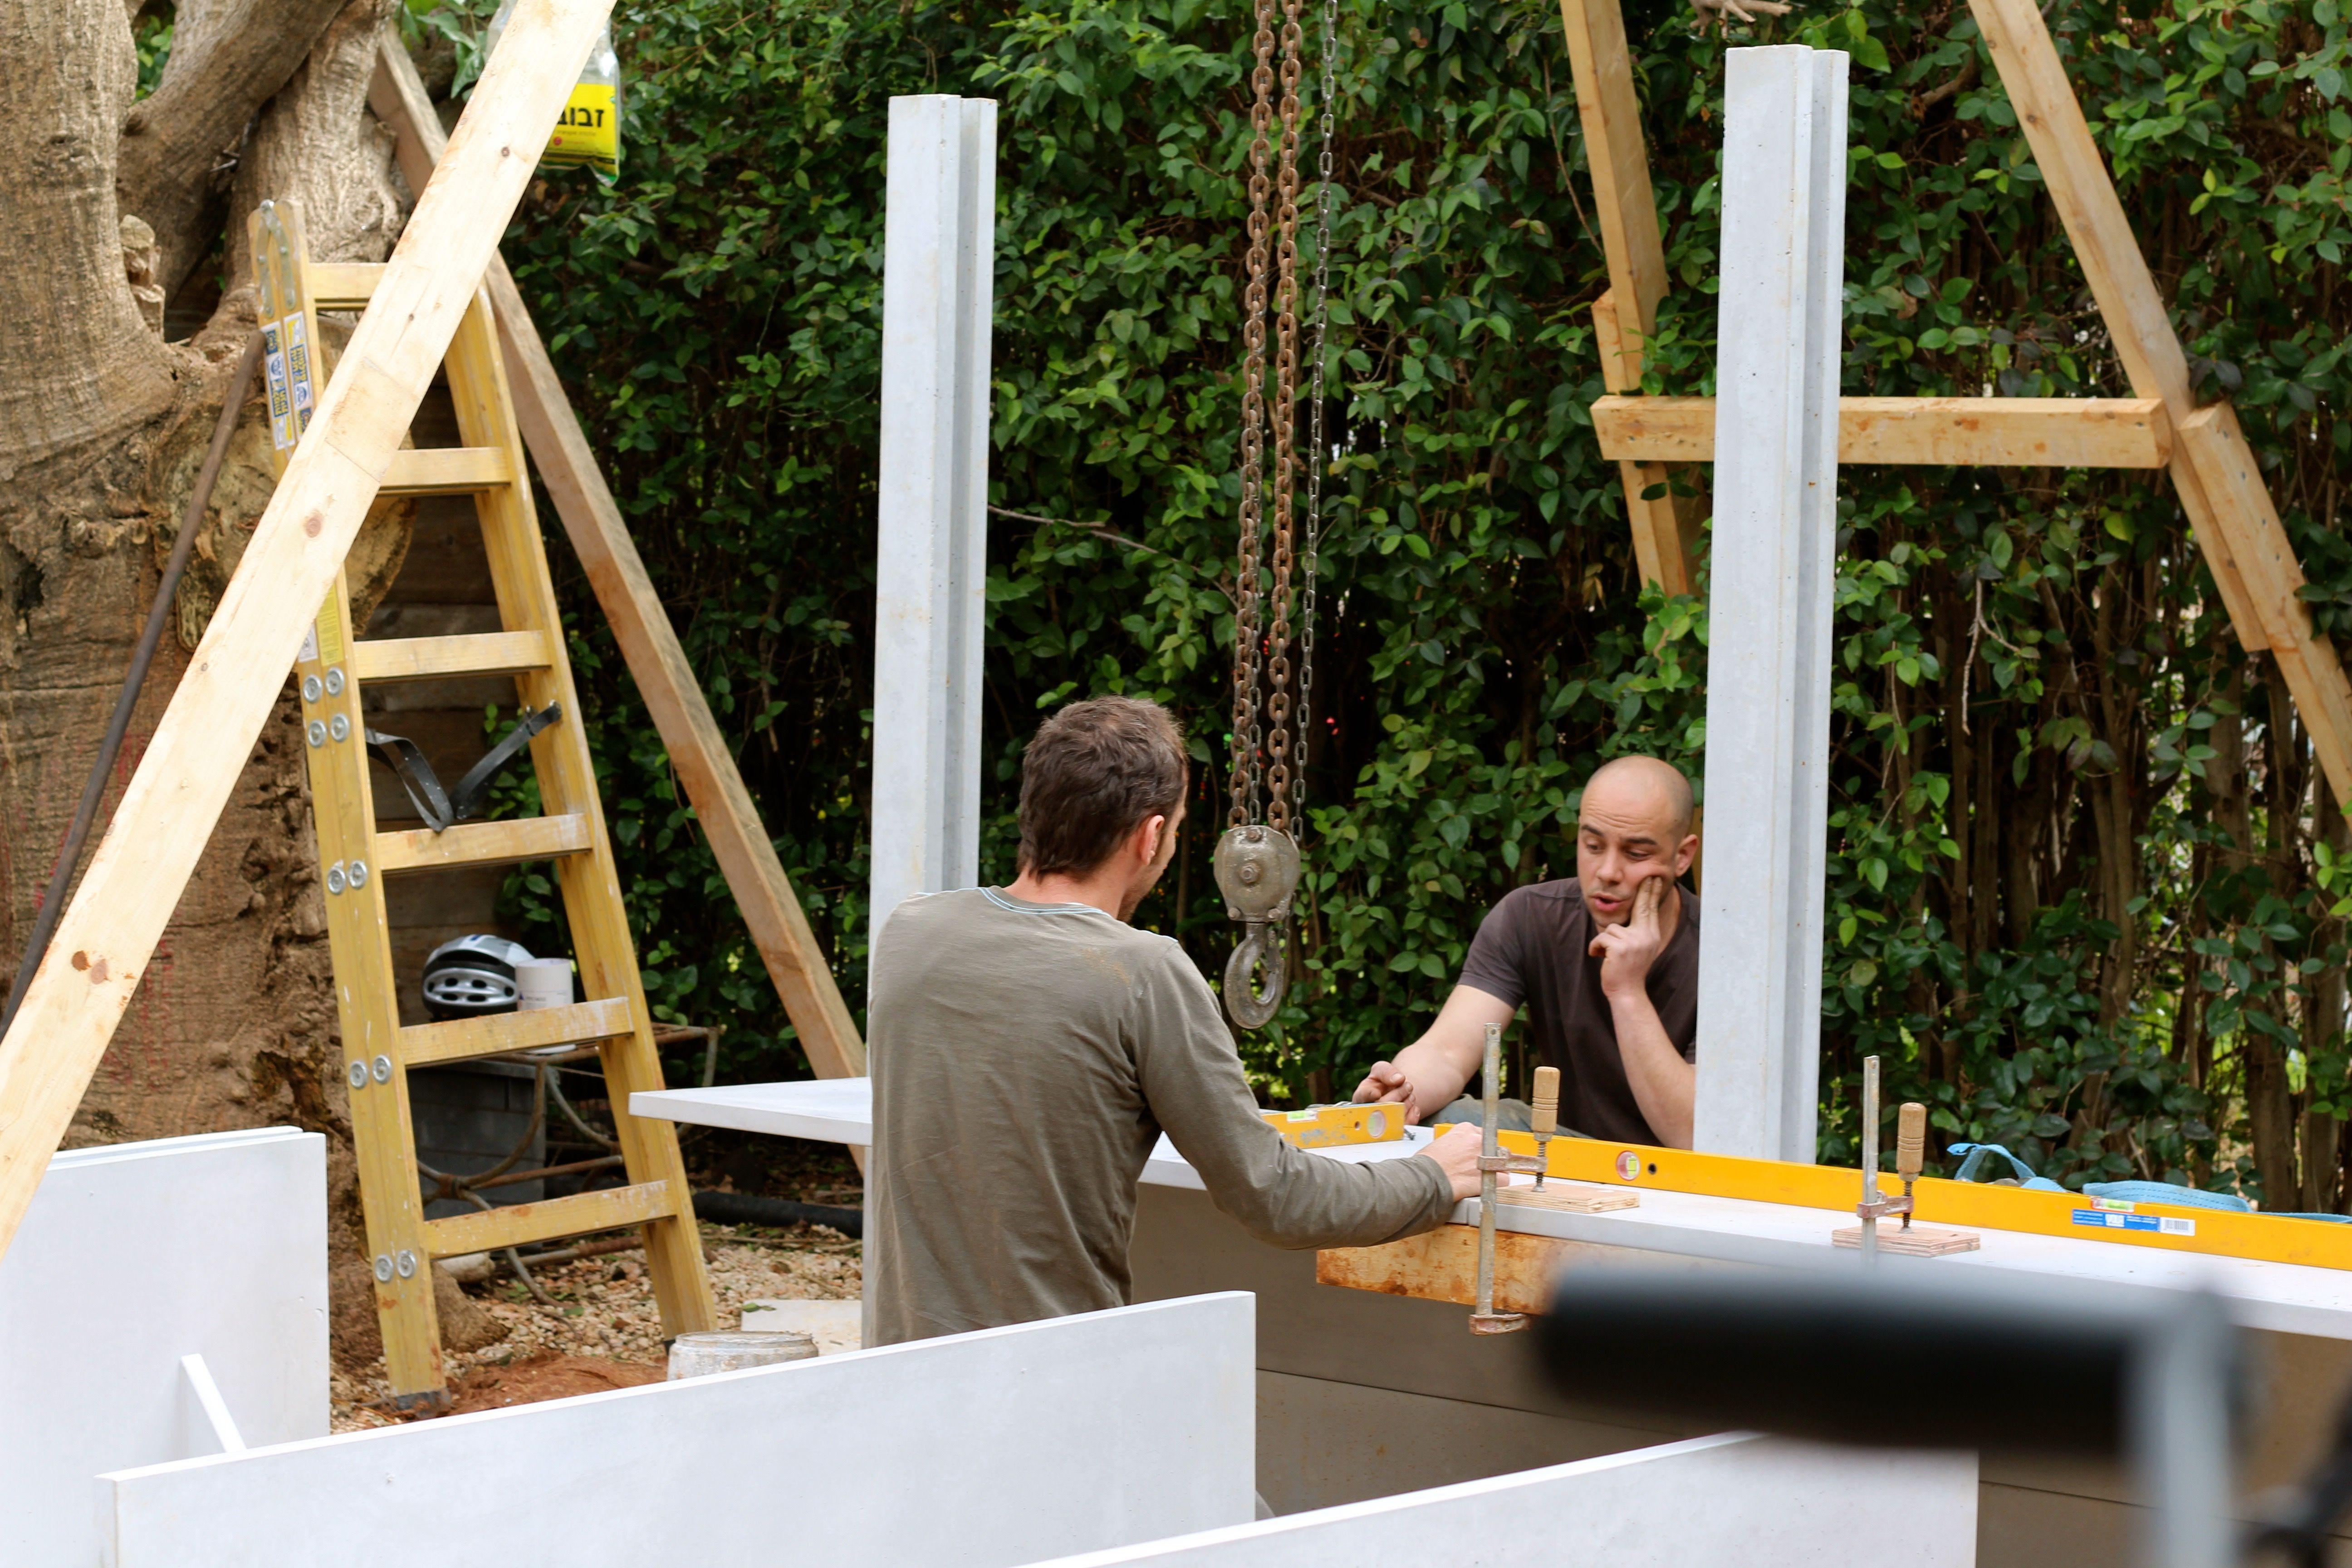 Installing the wwoo outdoor kitchen wwoo installation